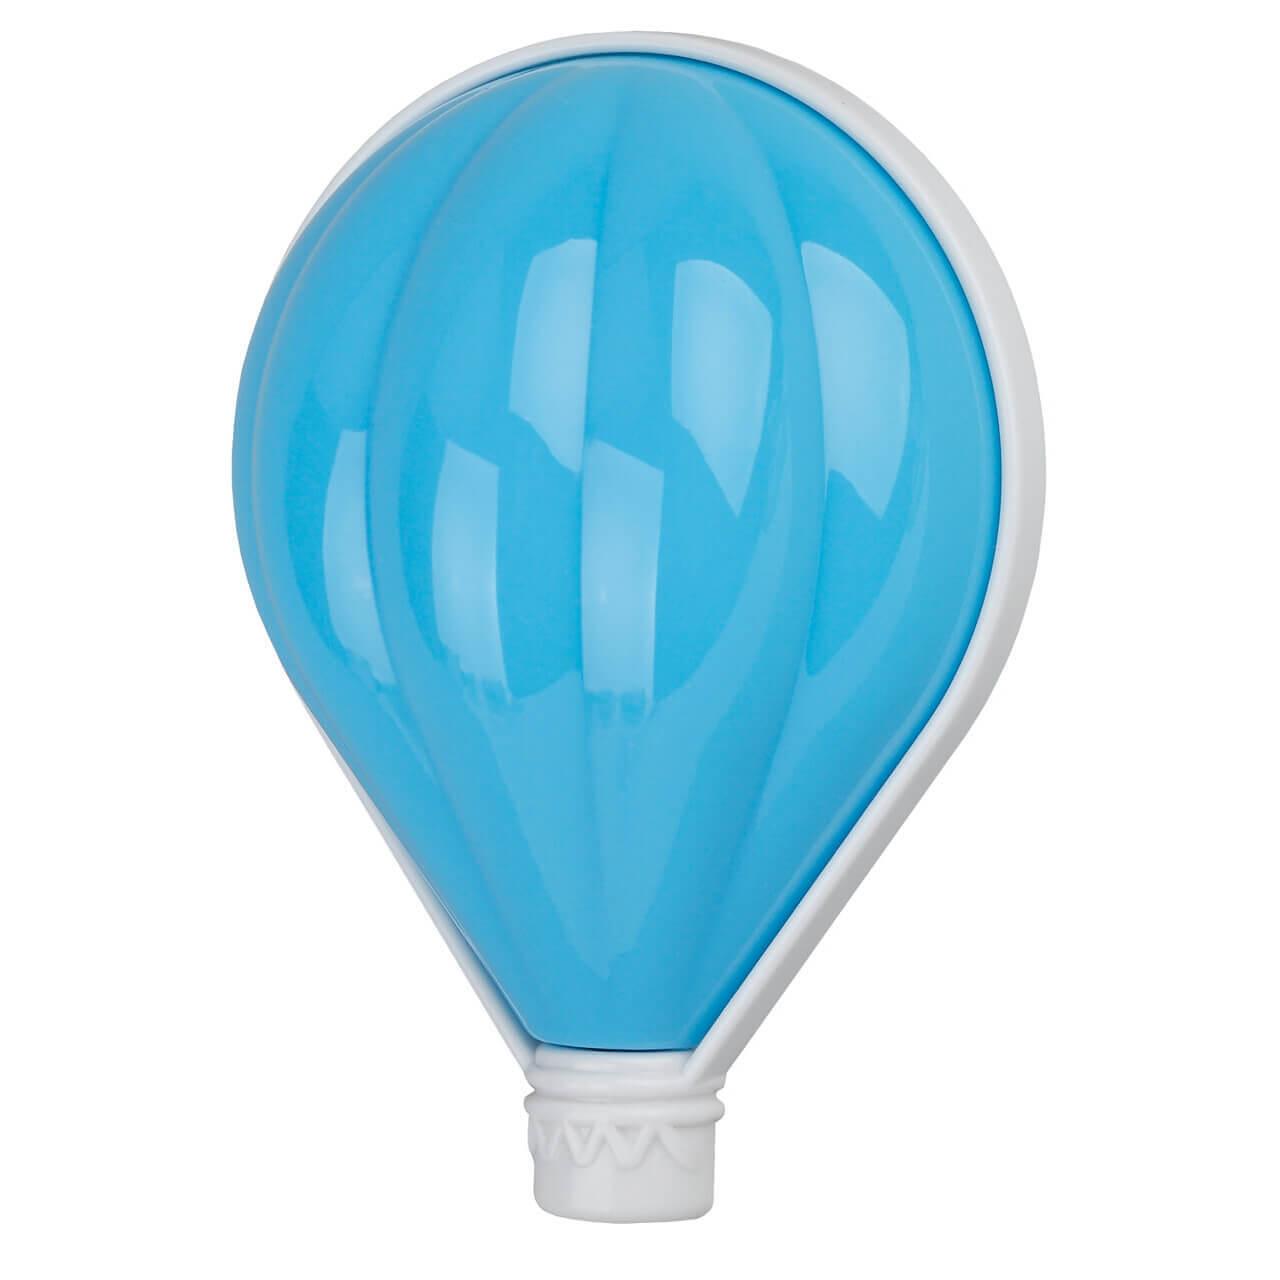 Настенный светодиодный светильник ЭРА NN-607-LS-BU эра nn 604 ls bu синий